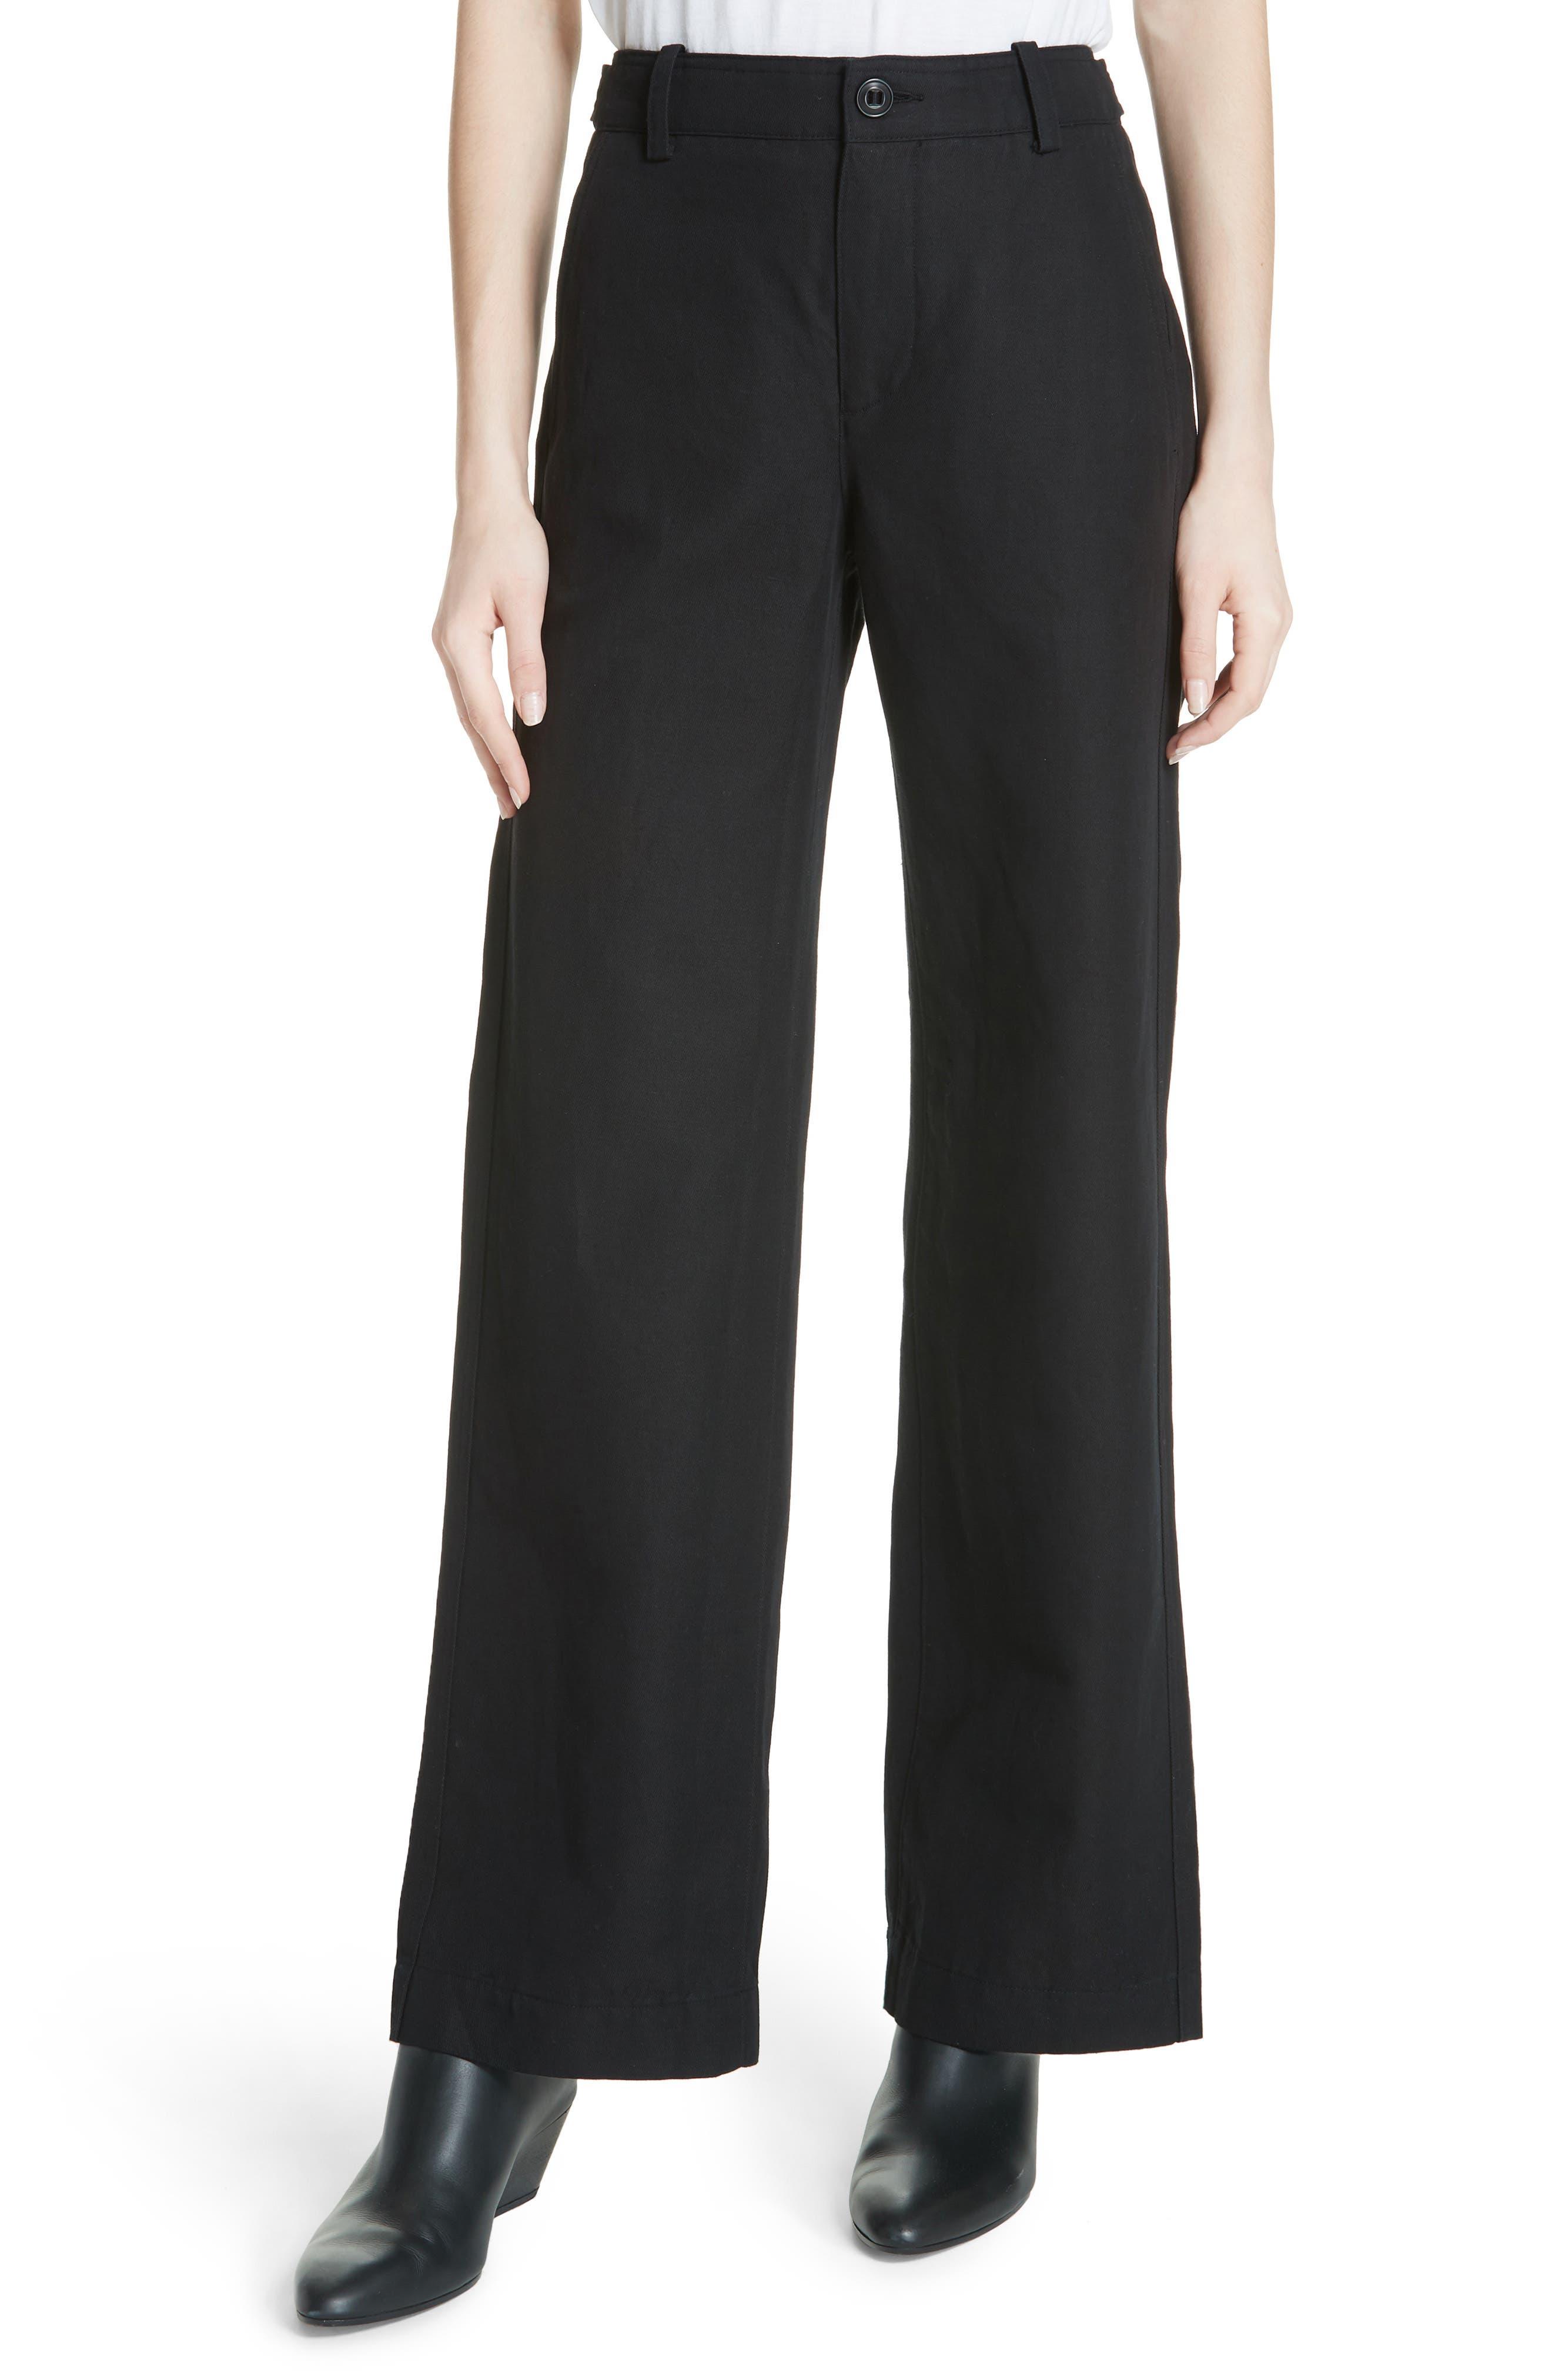 Alternate Image 1 Selected - Vince High Rise Linen Blend Wide Leg Pants